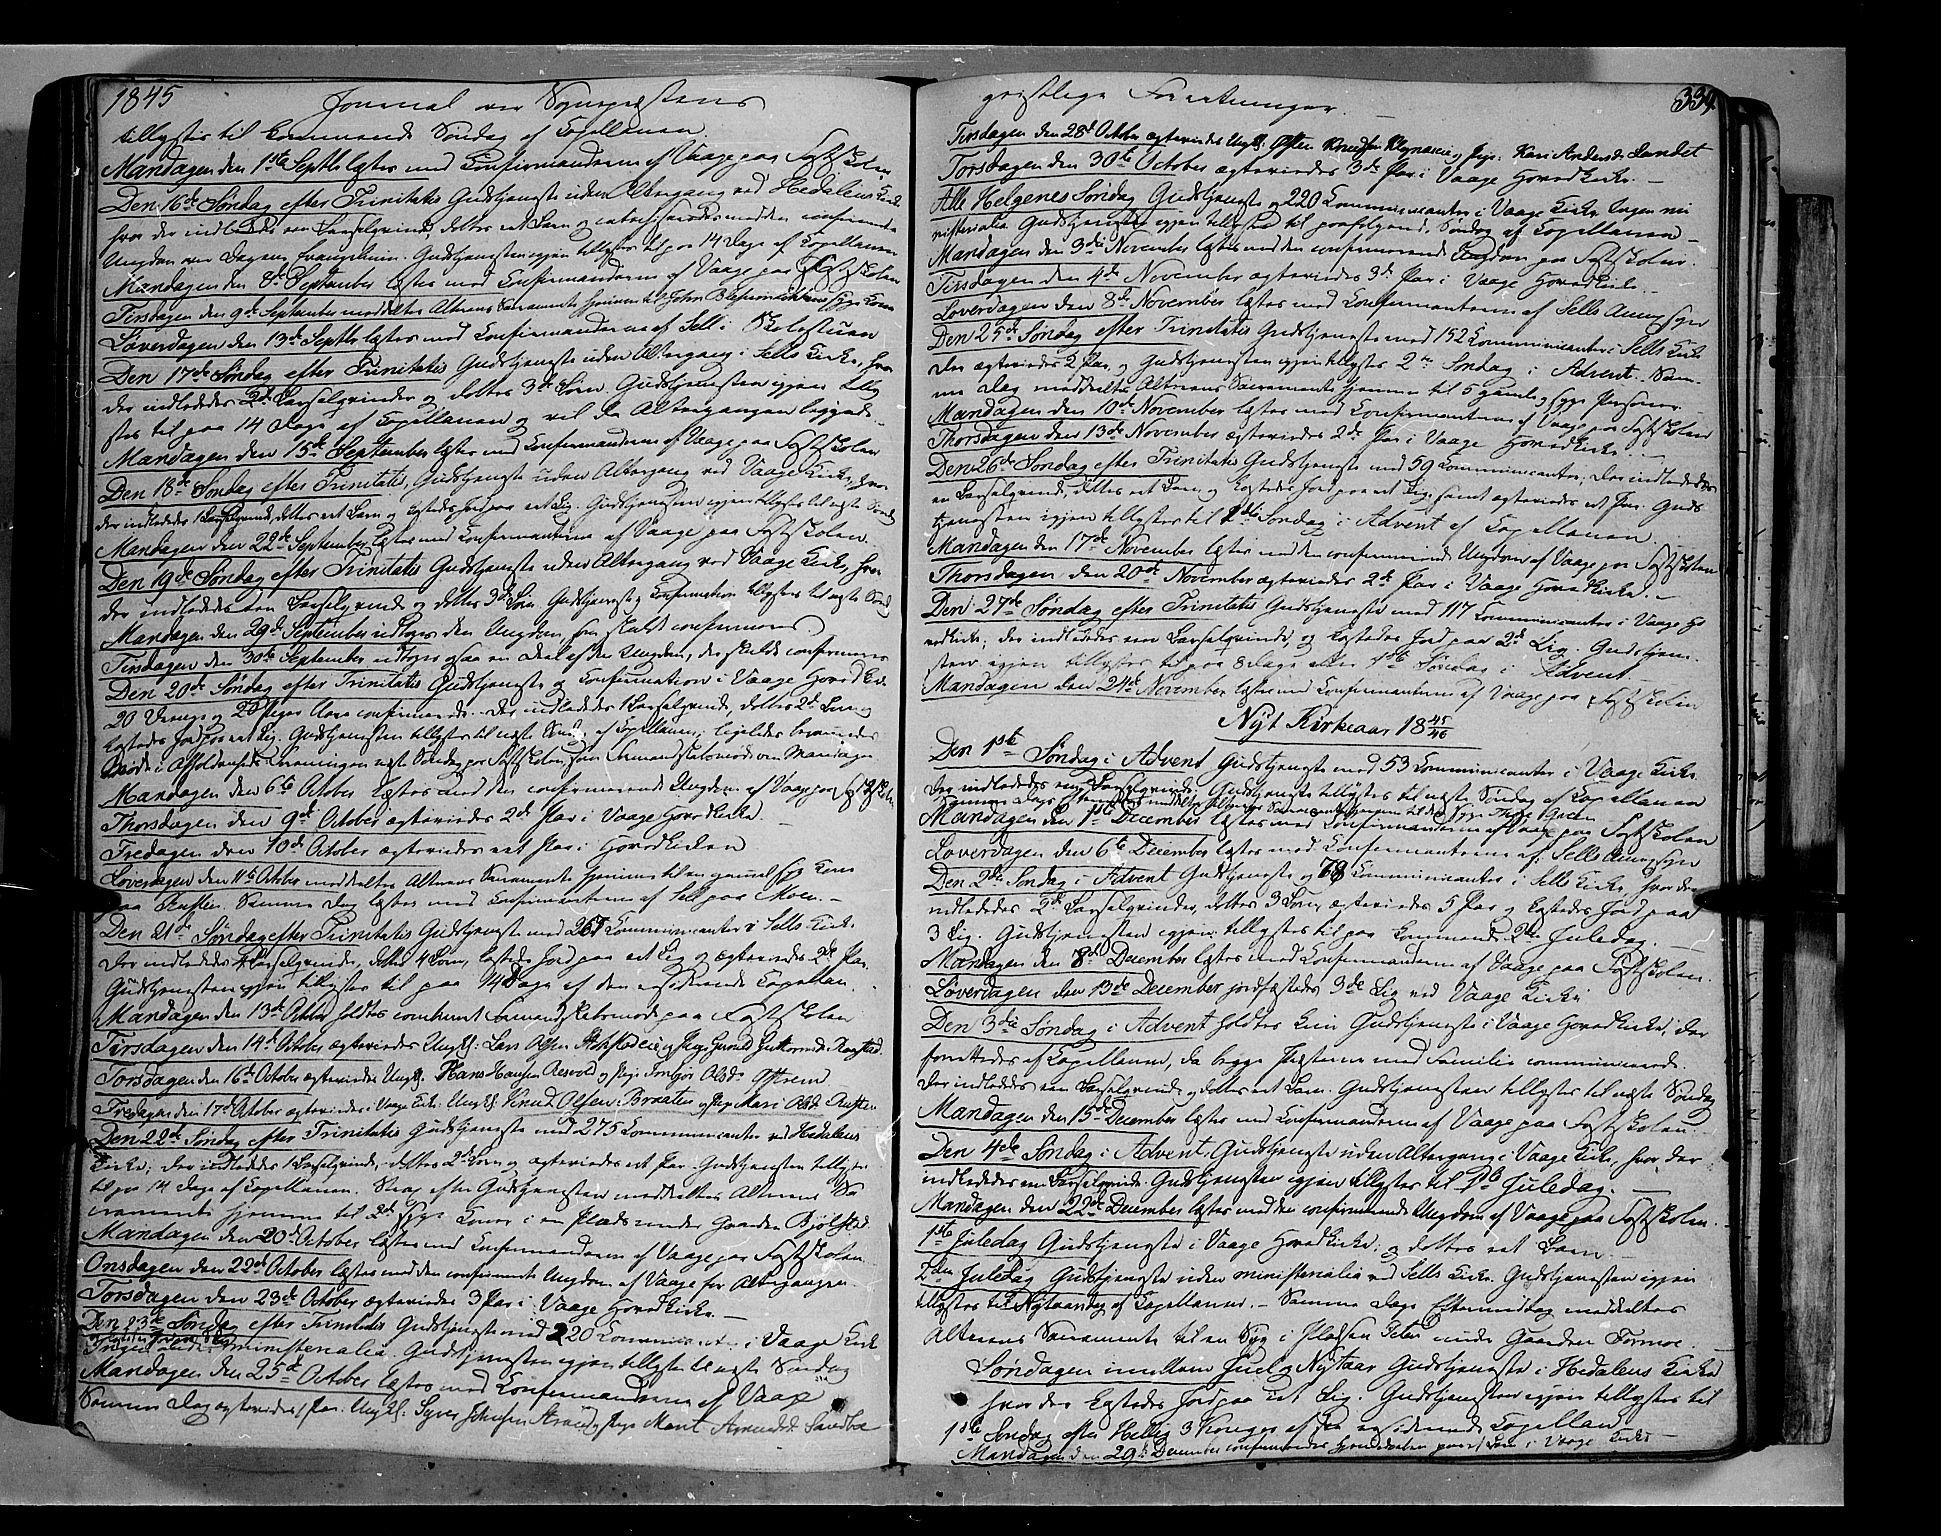 SAH, Vågå prestekontor, Ministerialbok nr. 5 /1, 1842-1856, s. 339